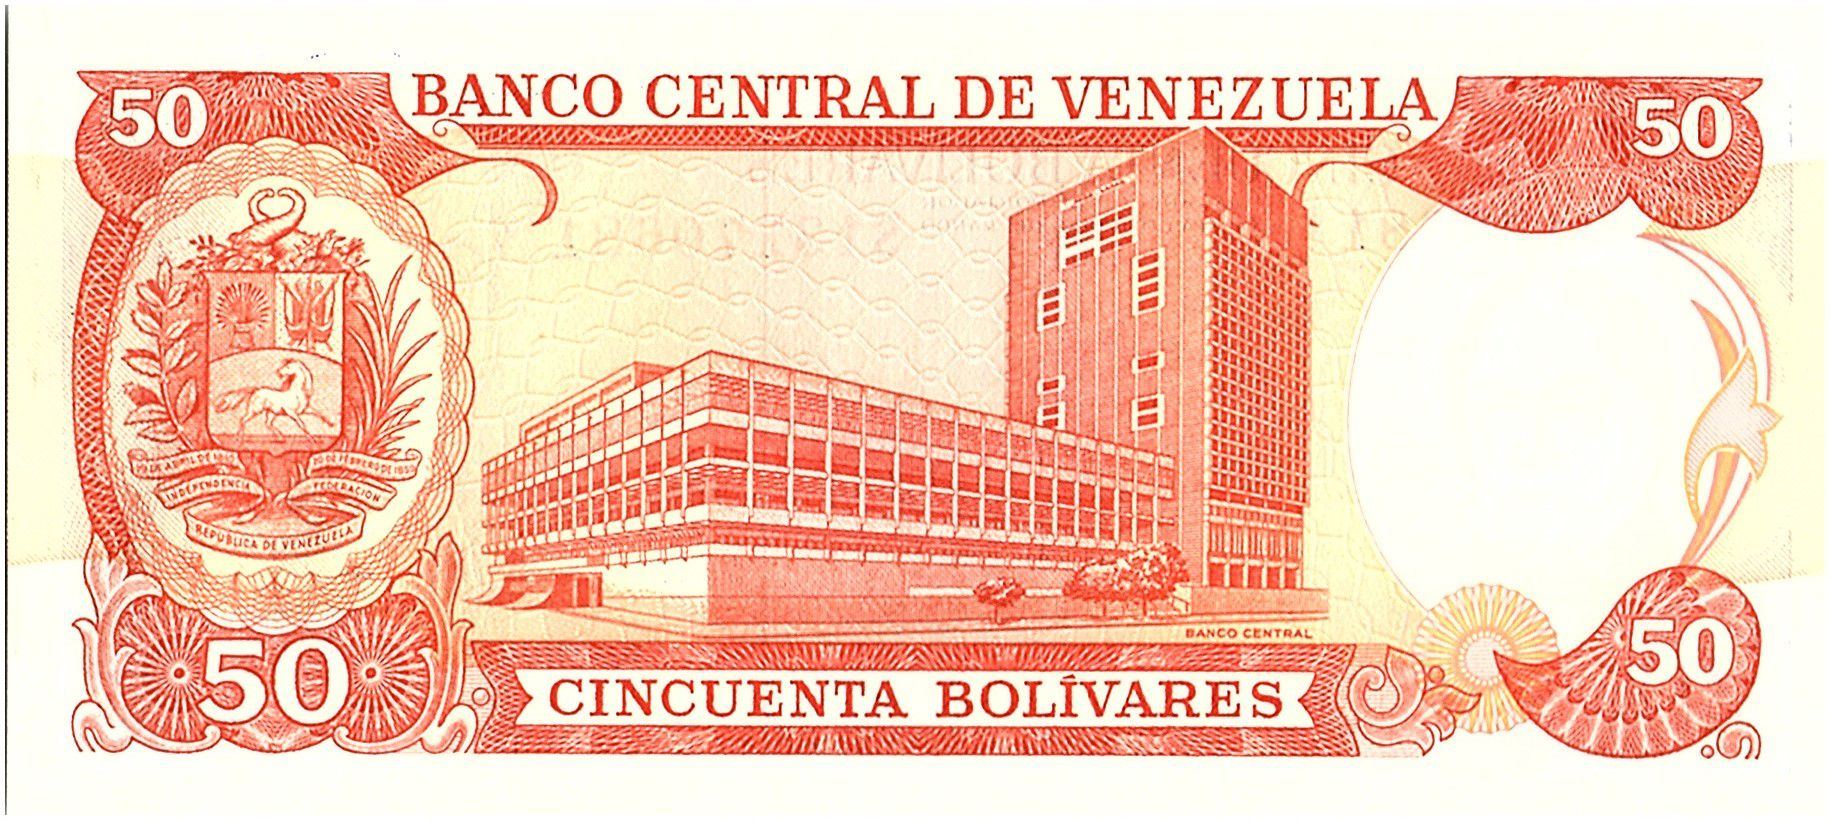 Venezuela 50 Bolivares,  Andres Bello - Banque central- 1992